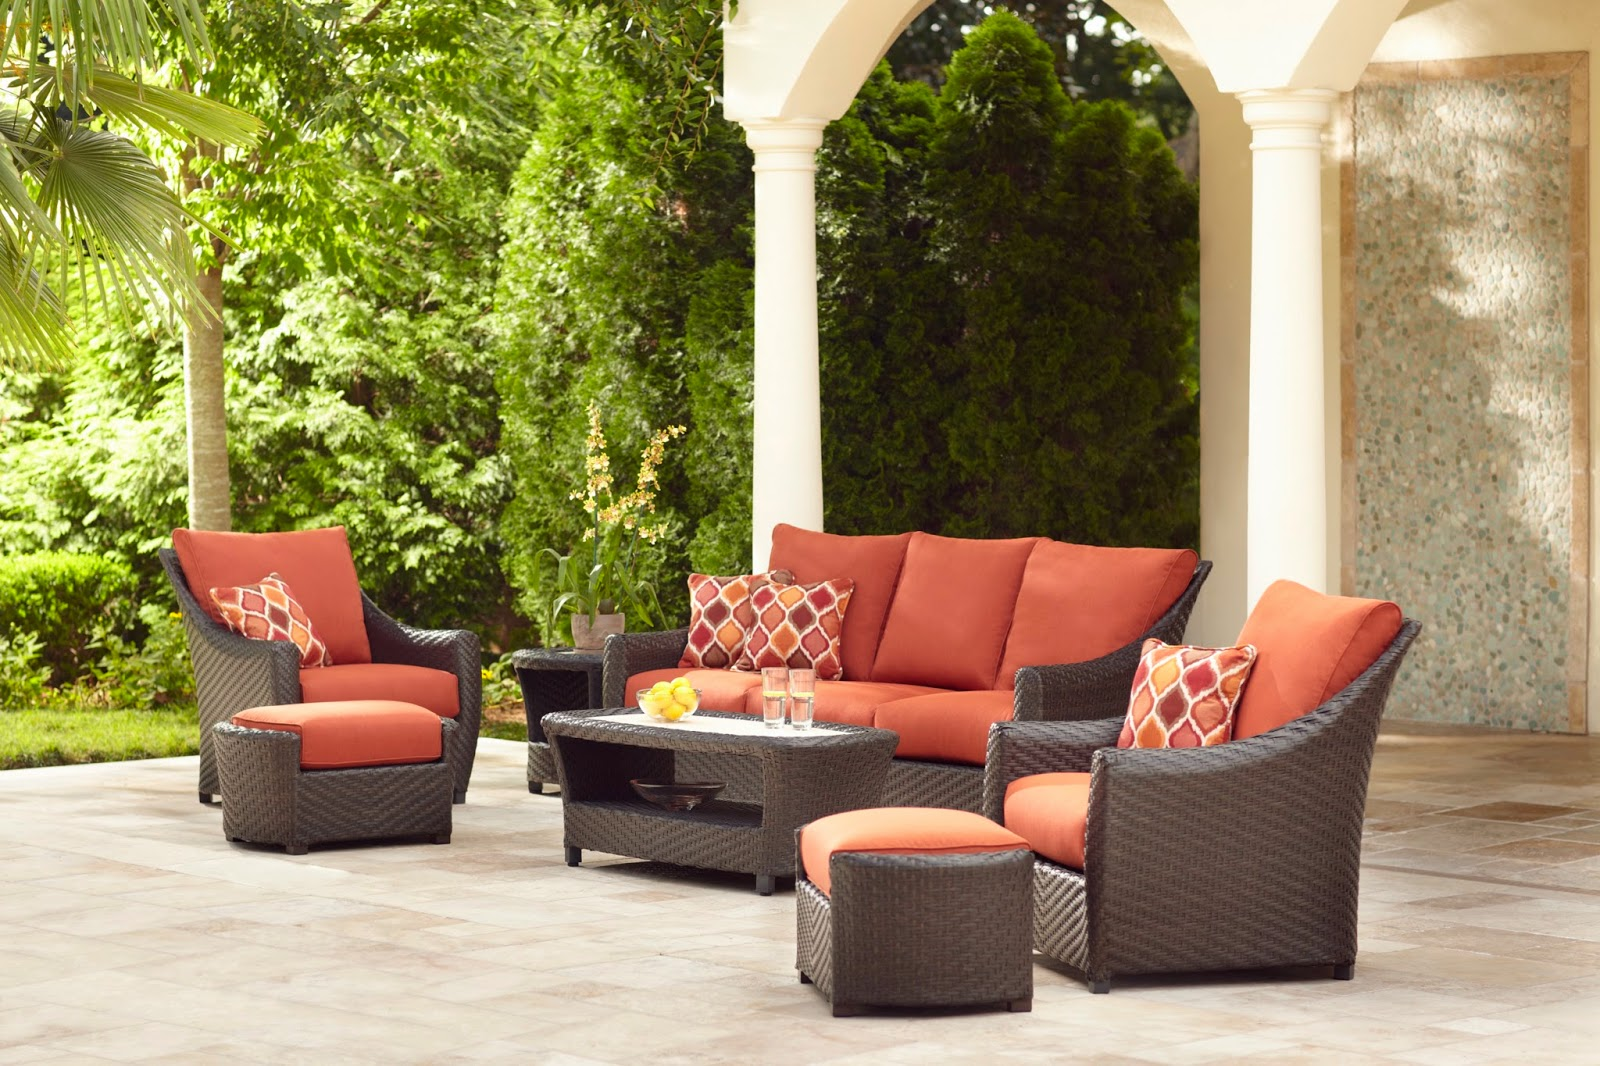 Superb Brown Jordan Labeled Patio Furniture Set 4 Chairs Table Download Free Architecture Designs Intelgarnamadebymaigaardcom